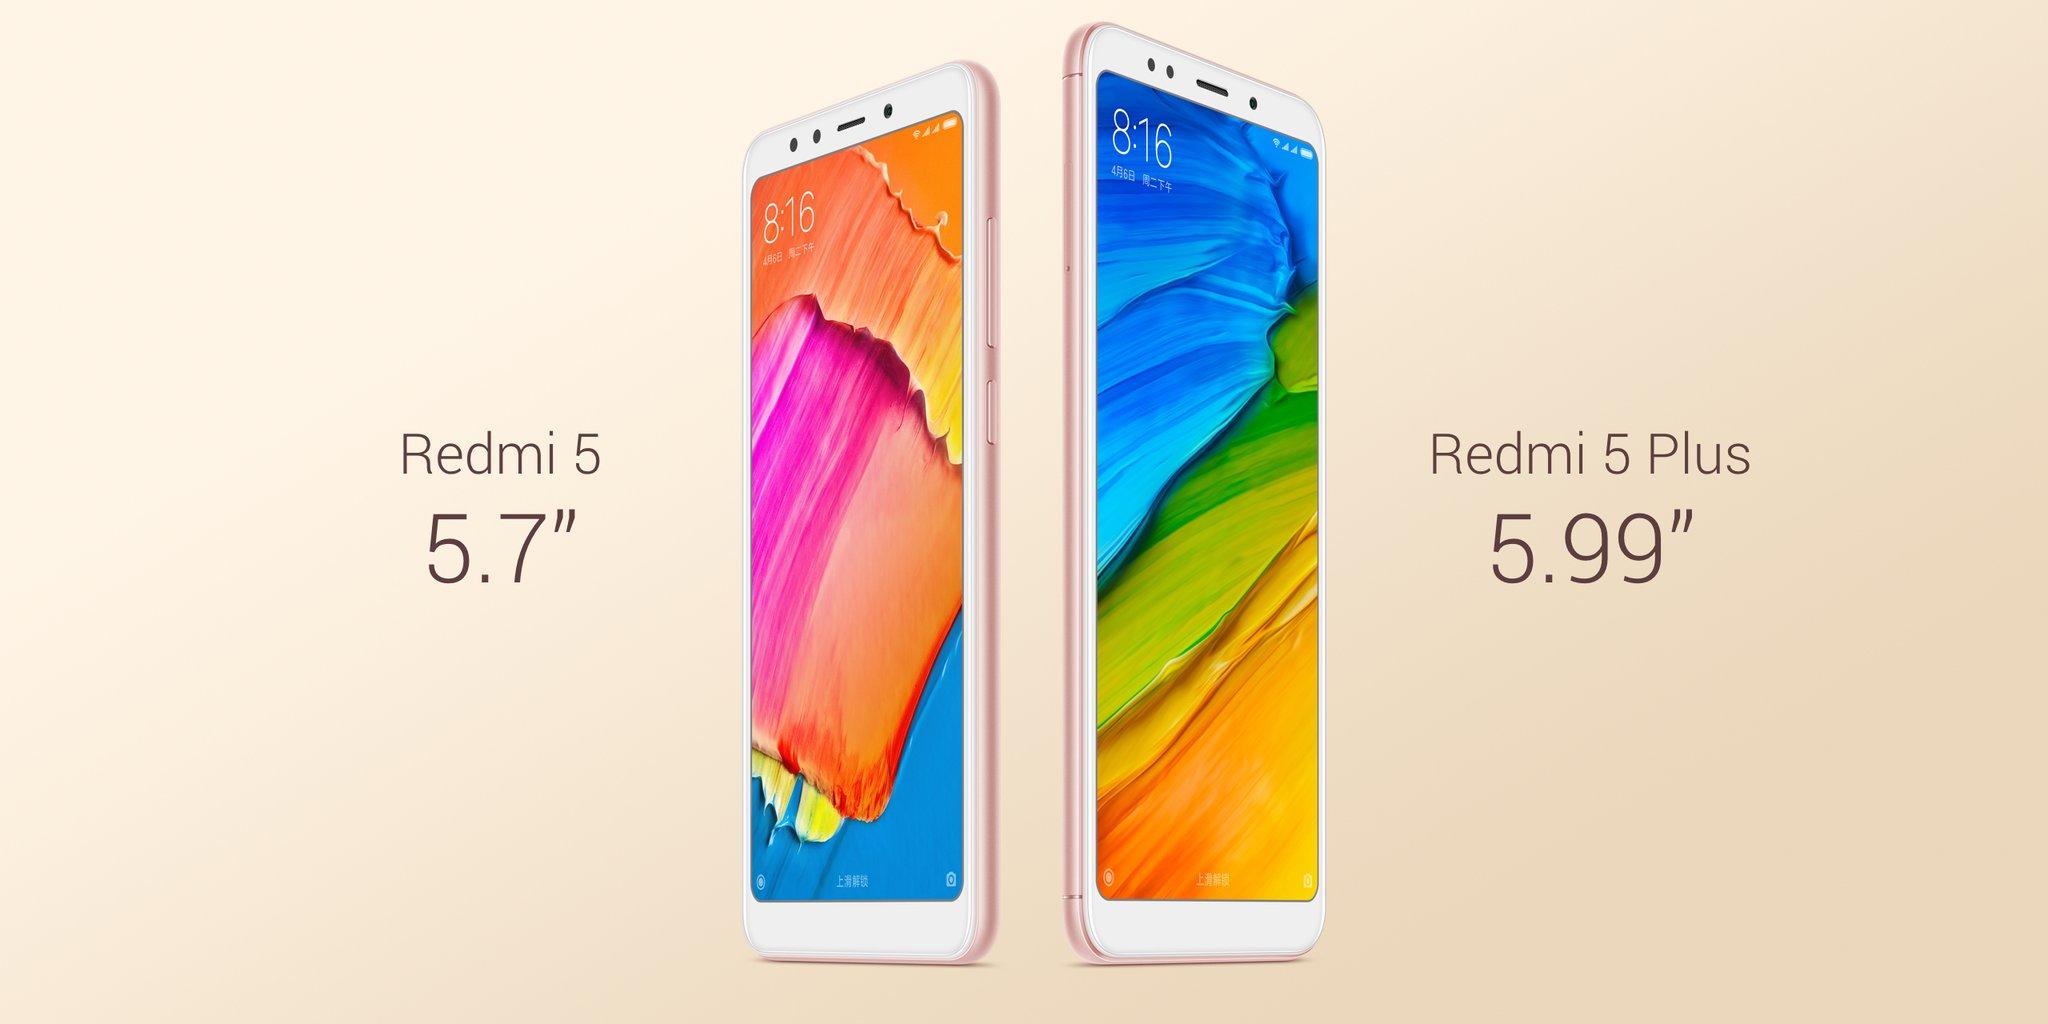 Image result for Install MIUI 10 On Xiaomi Redmi 5 and Redmi 5 Plus